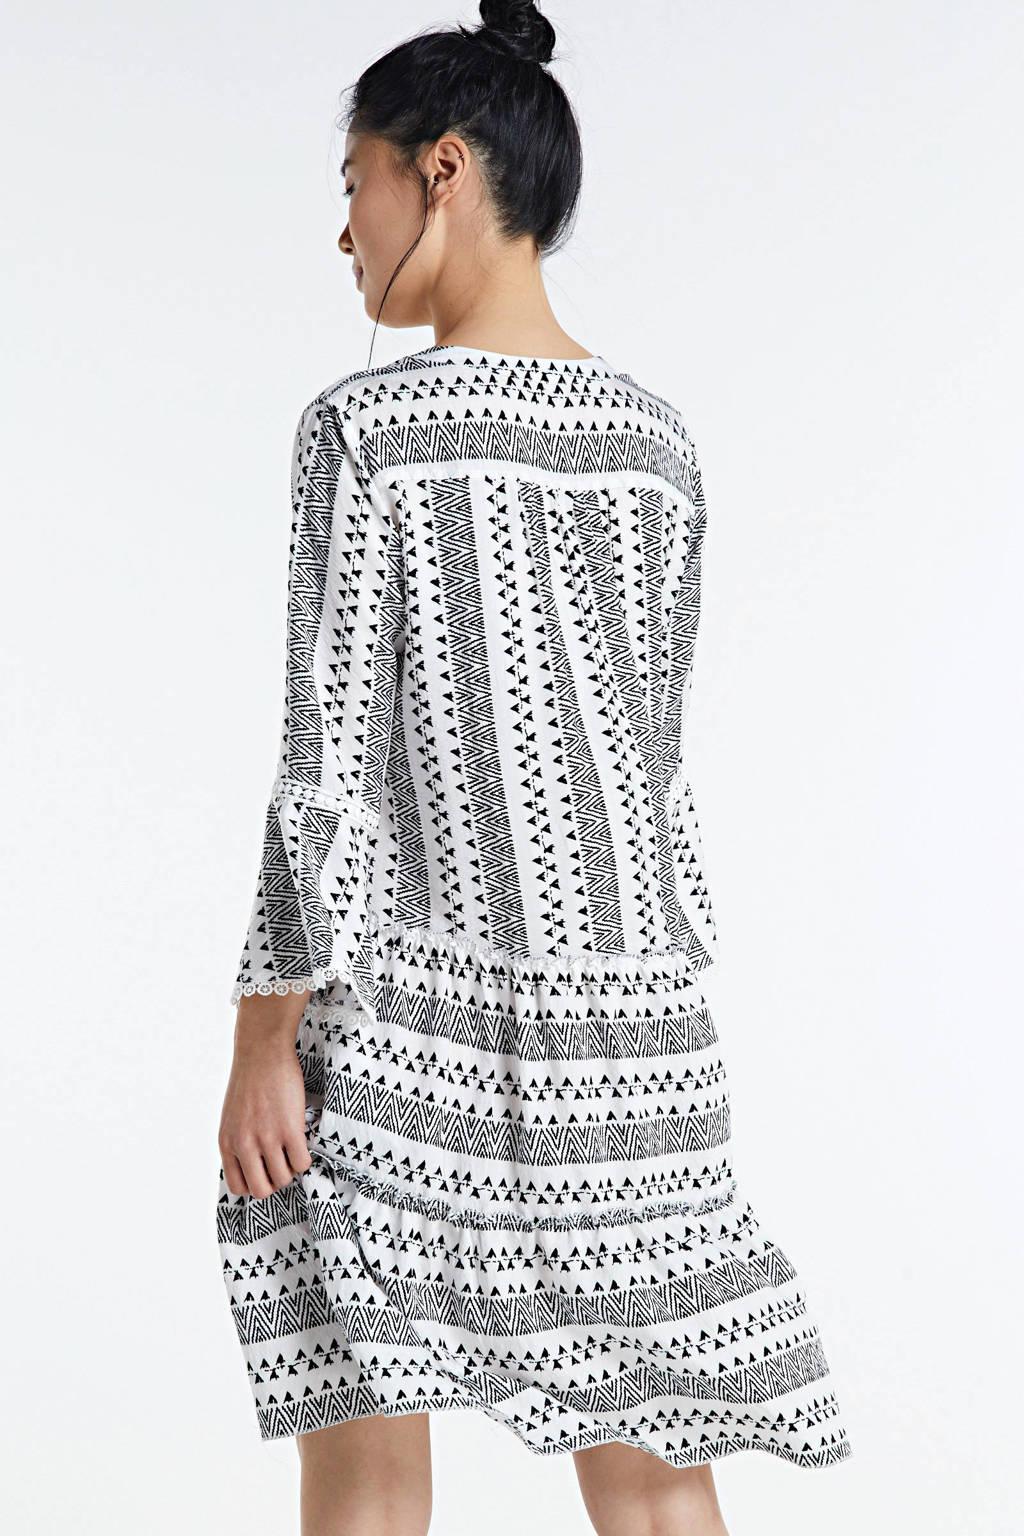 Smashed Lemon jurk met all over print en borduursels wit/zwart, Wit/zwart